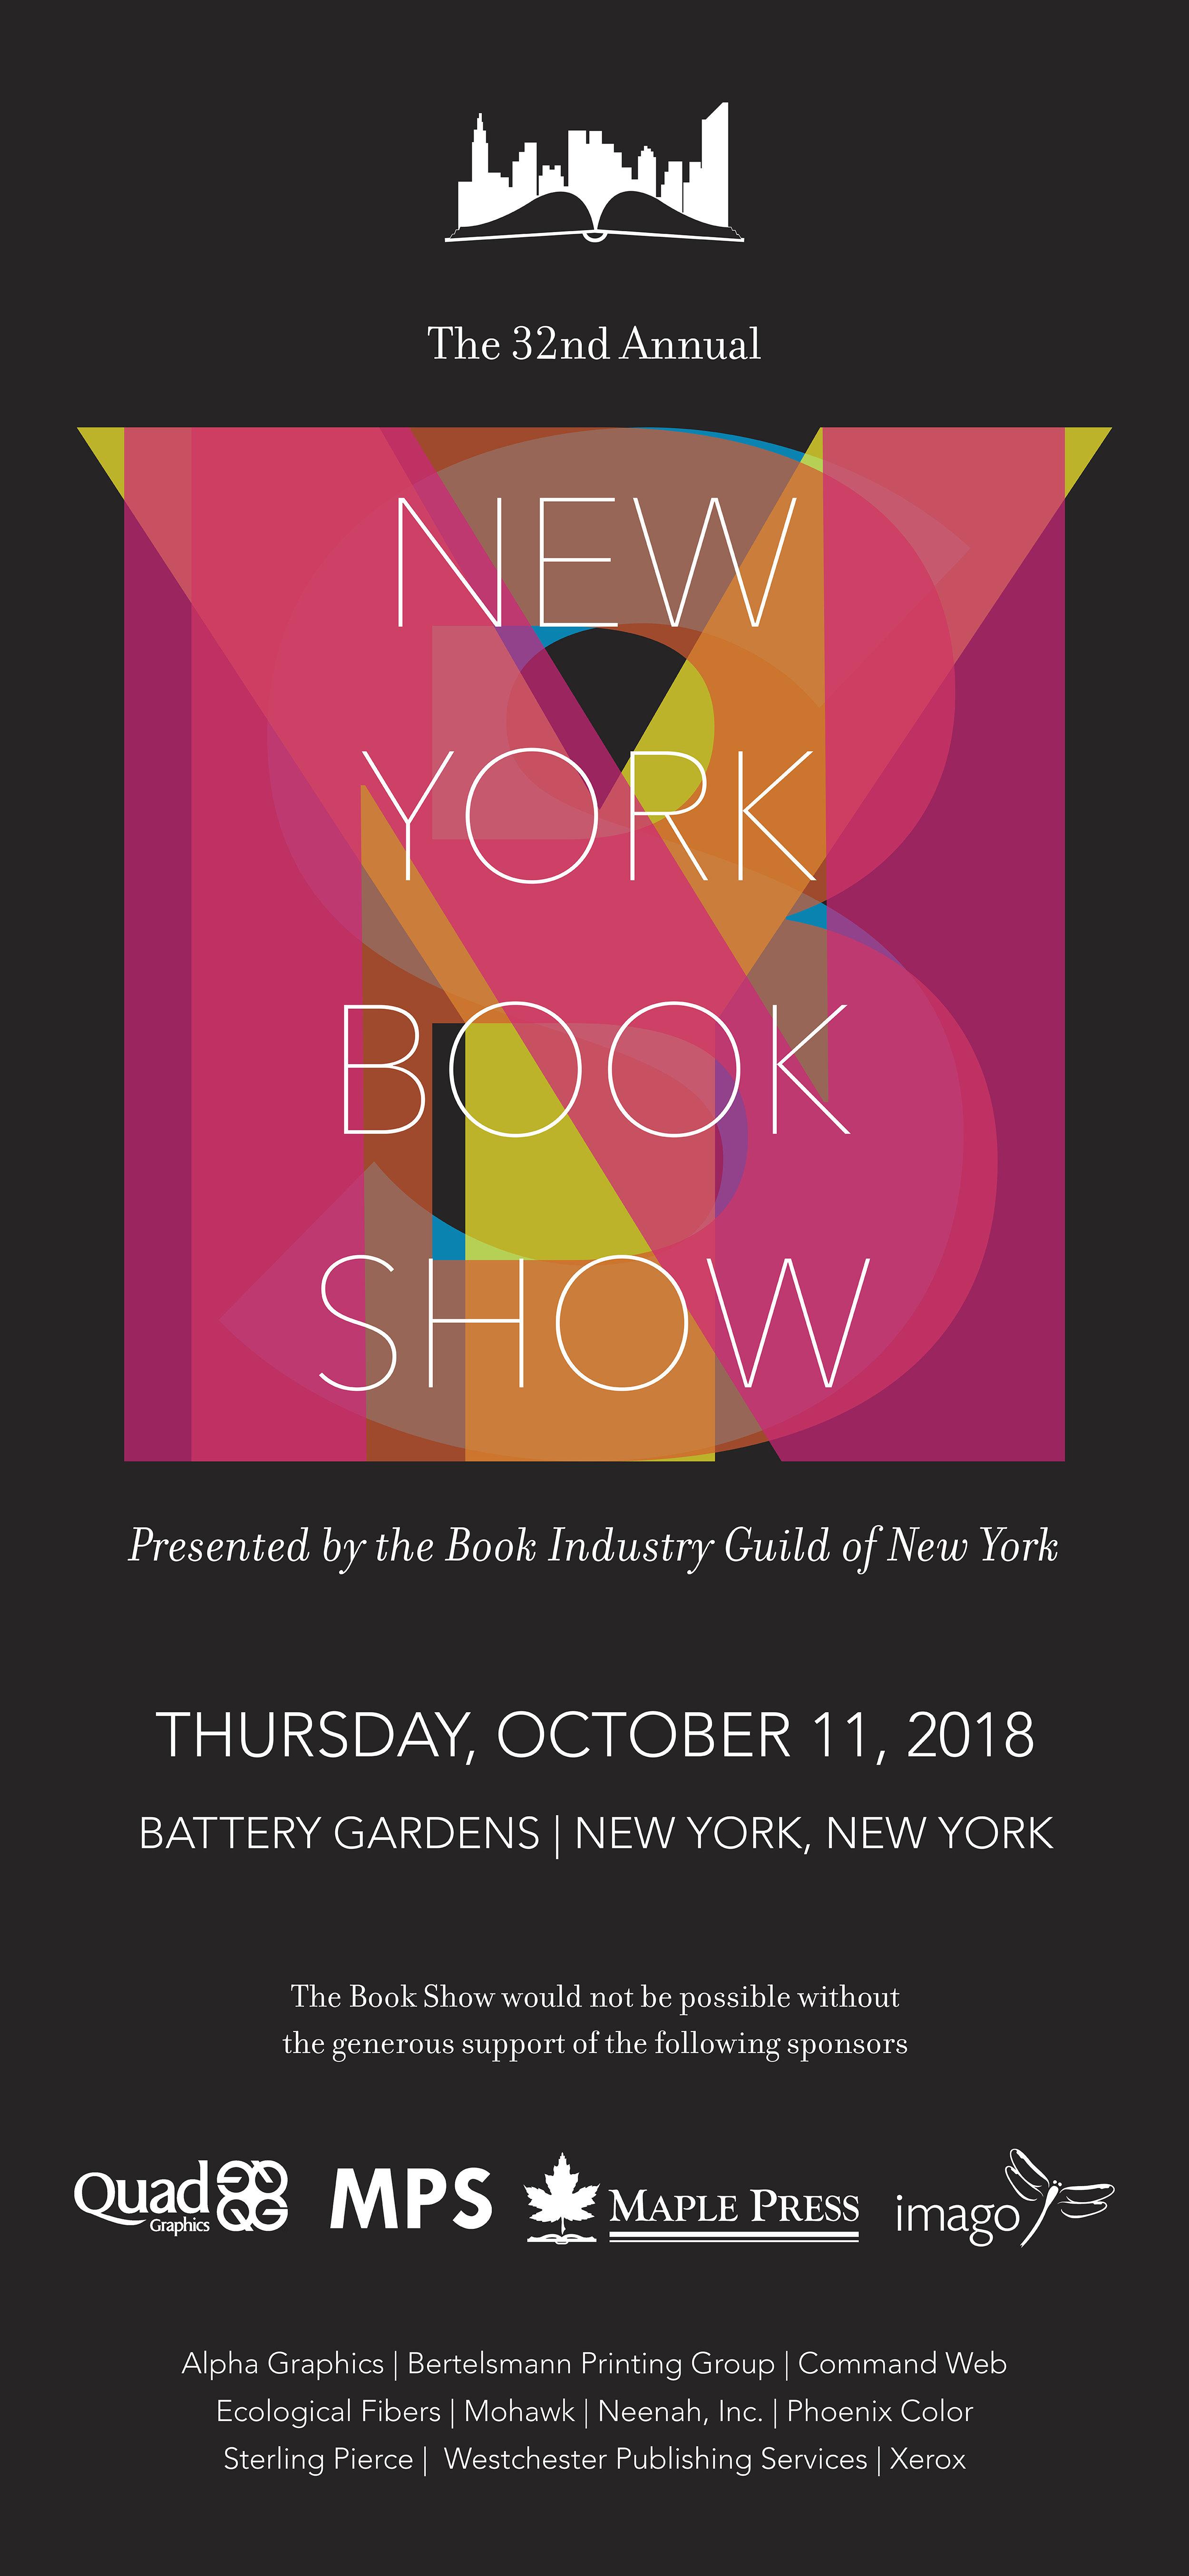 New York Book Show 2018 banner